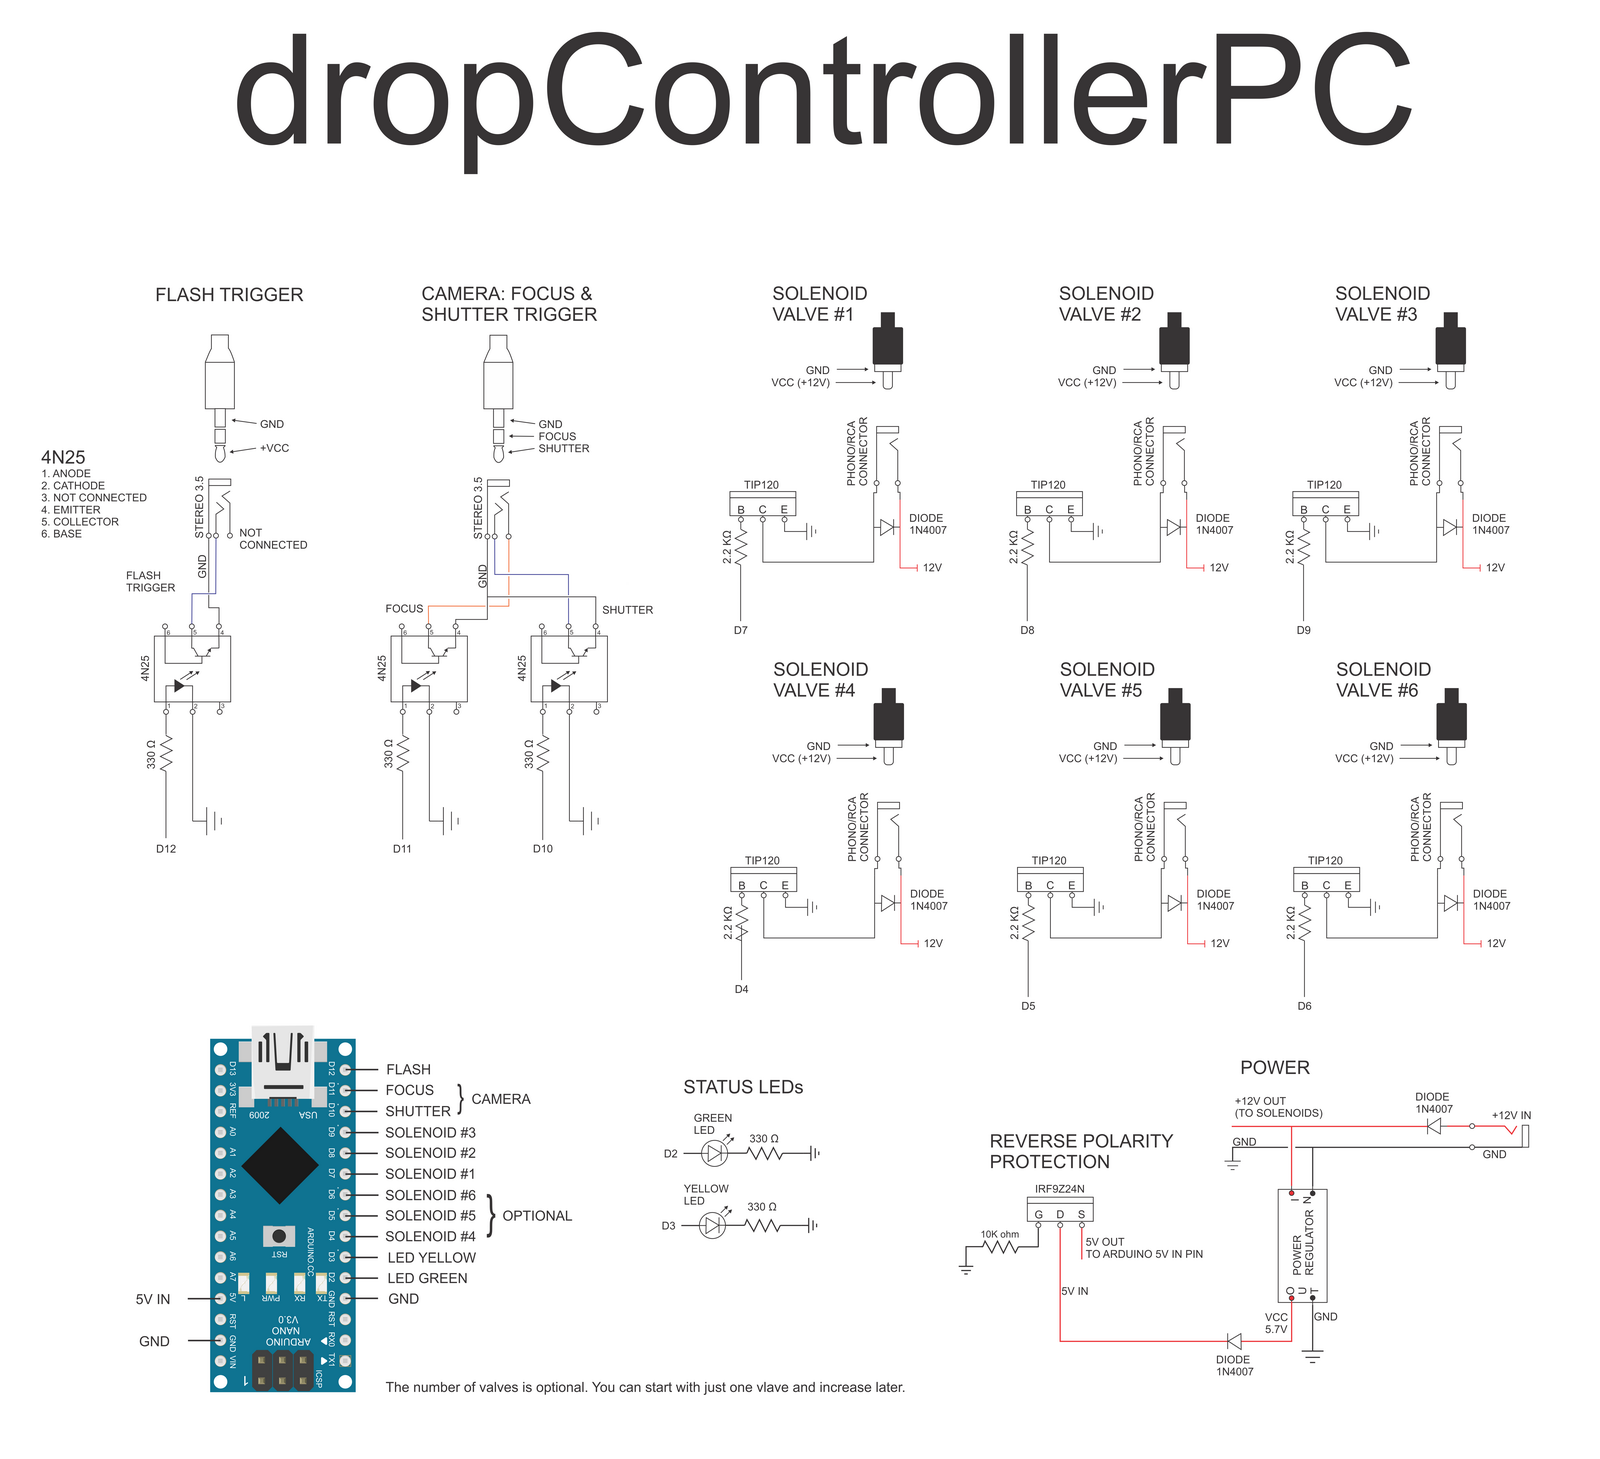 dropcontroller   diy arduino solenoid valve controller for ... drop in oven wiring diagram #8